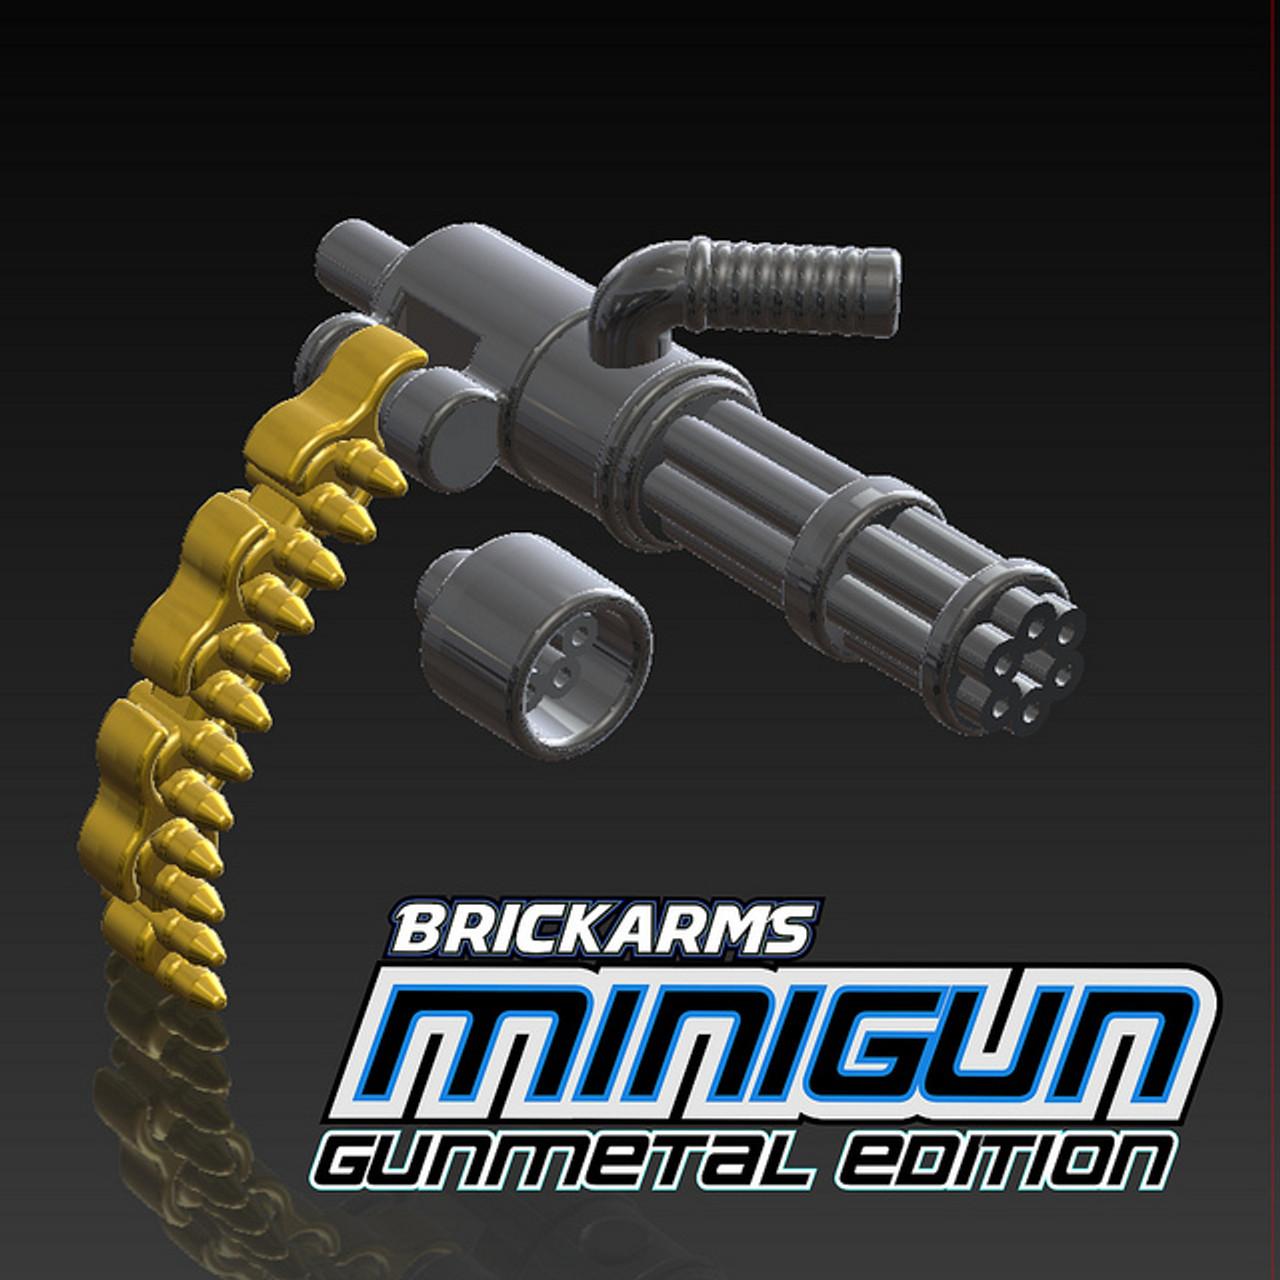 Minigun Bullet BrickArms Minigun with...